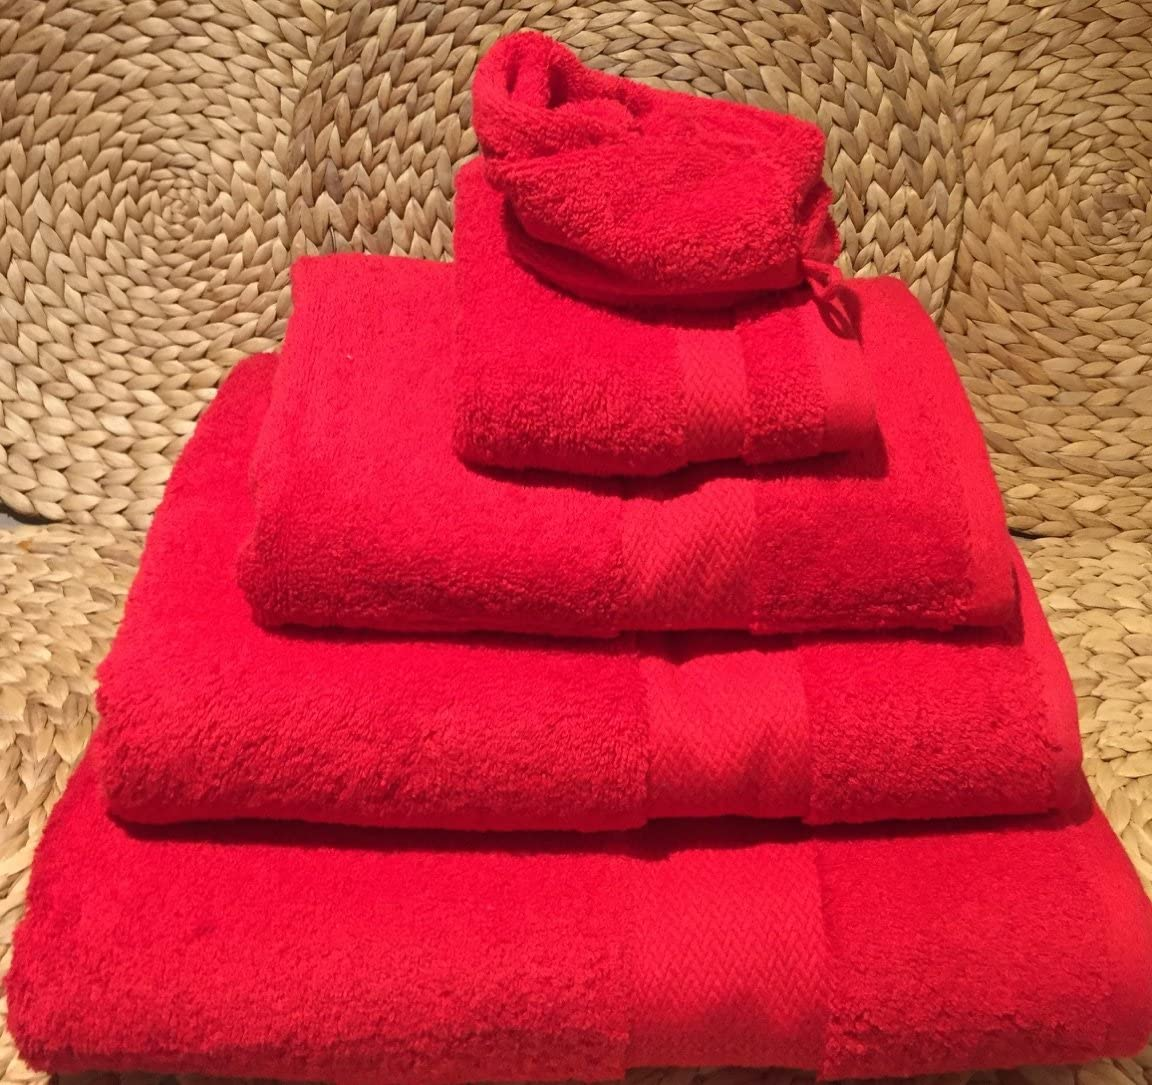 Salomé Prestige Maxi – Toalla de baño algodón Peinado 550 gr/m² Rojo 100 x 150: Amazon.es: Hogar